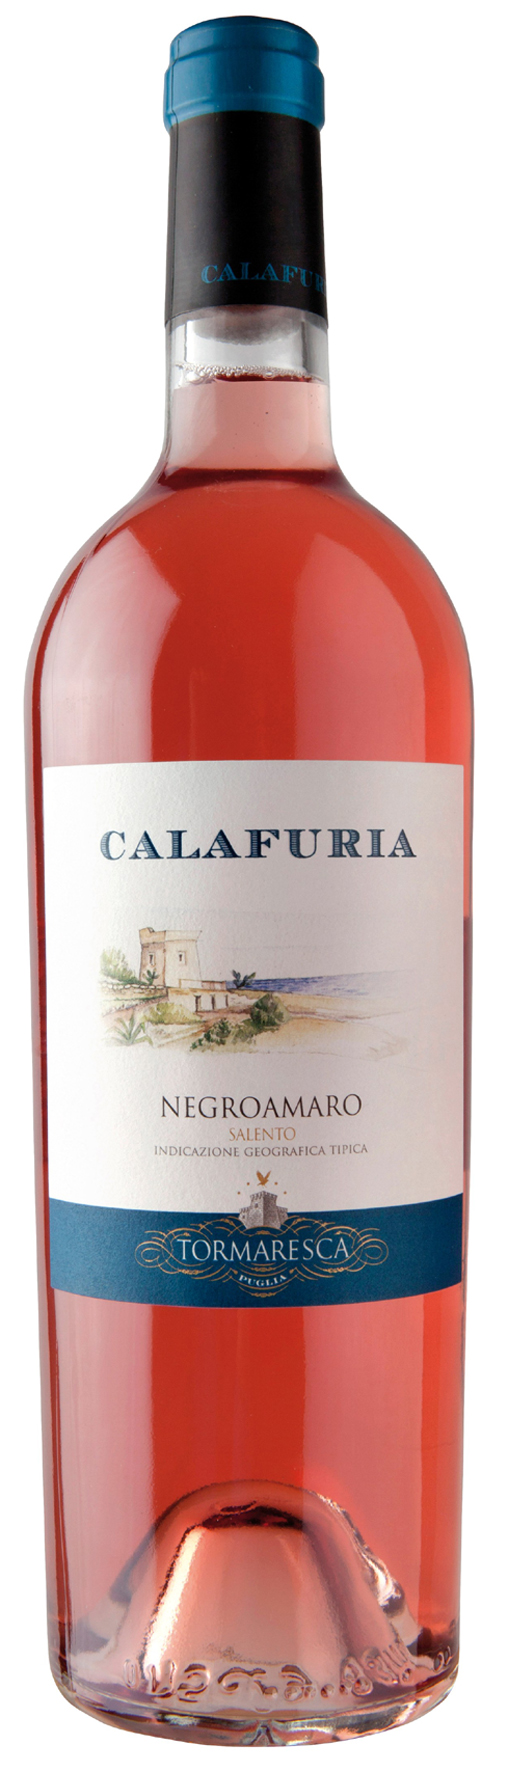 Calafuria Rosé - Negroamaro IGT Salento Tormaresca 2015